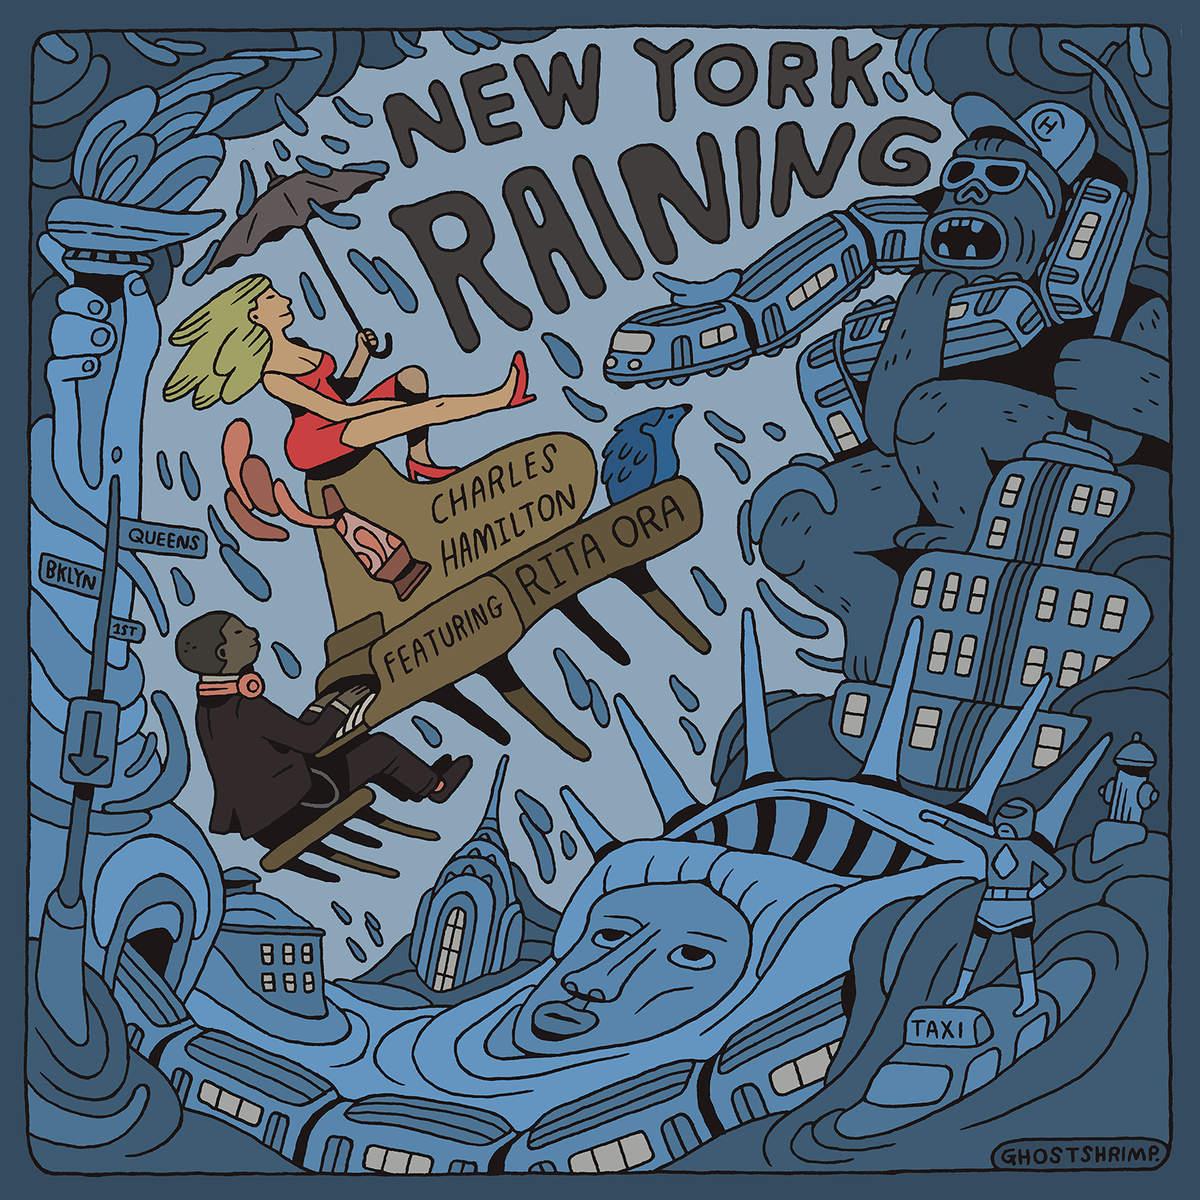 Charles-Hamilton-New-York-Raining-2015-1200x1200.png